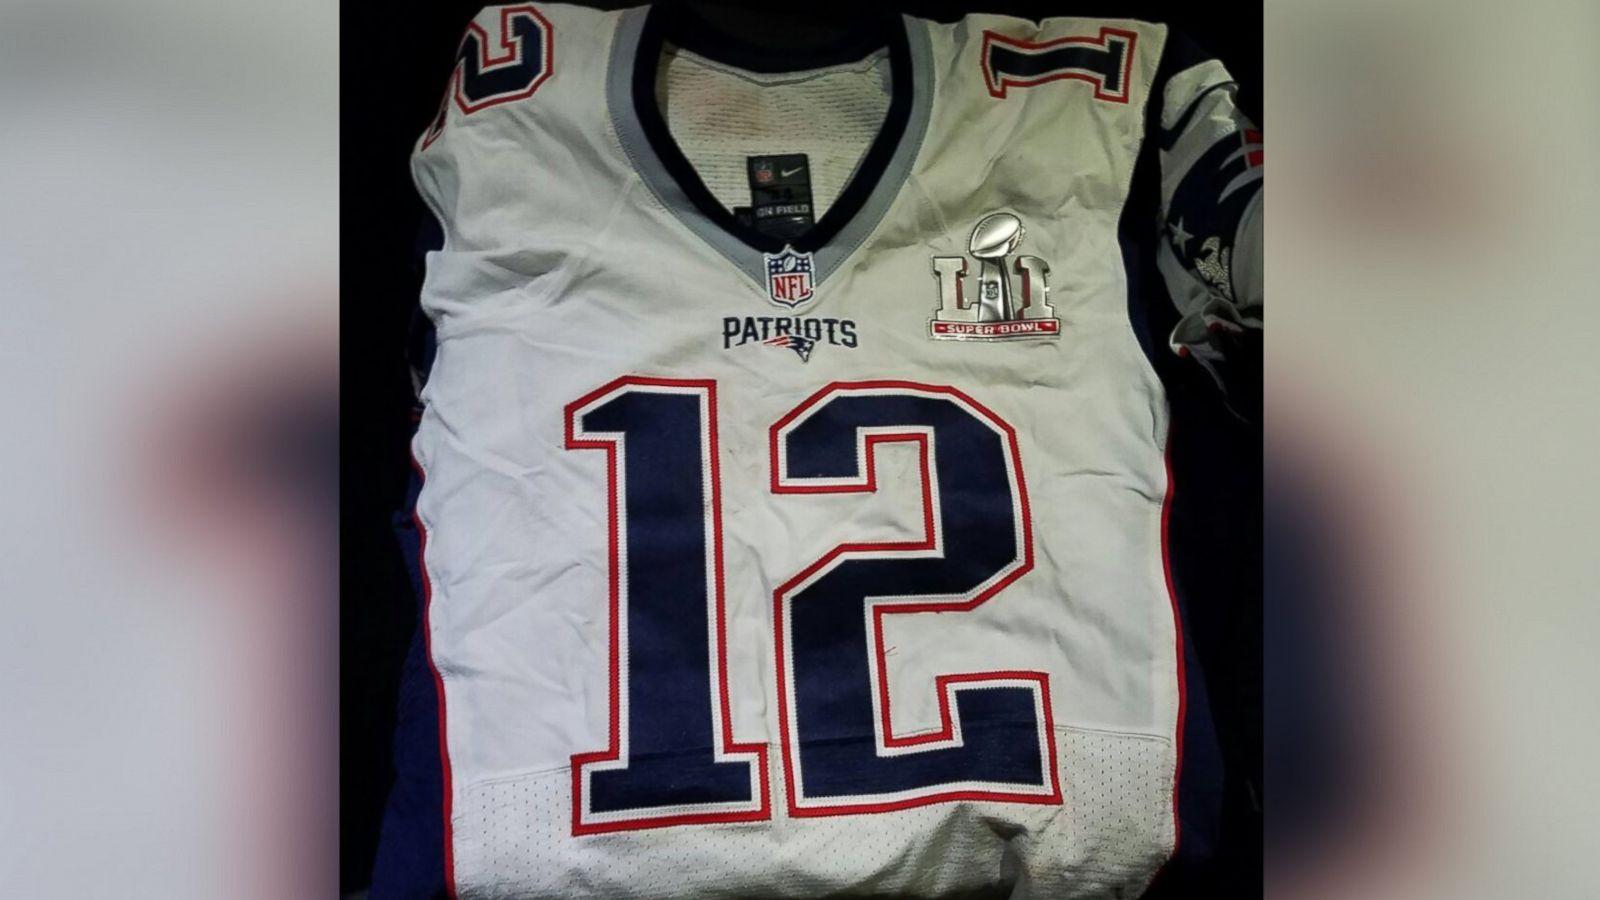 Tom Brady s Super Bowl jersey resurfaces in new photo - ABC News 543aa5534